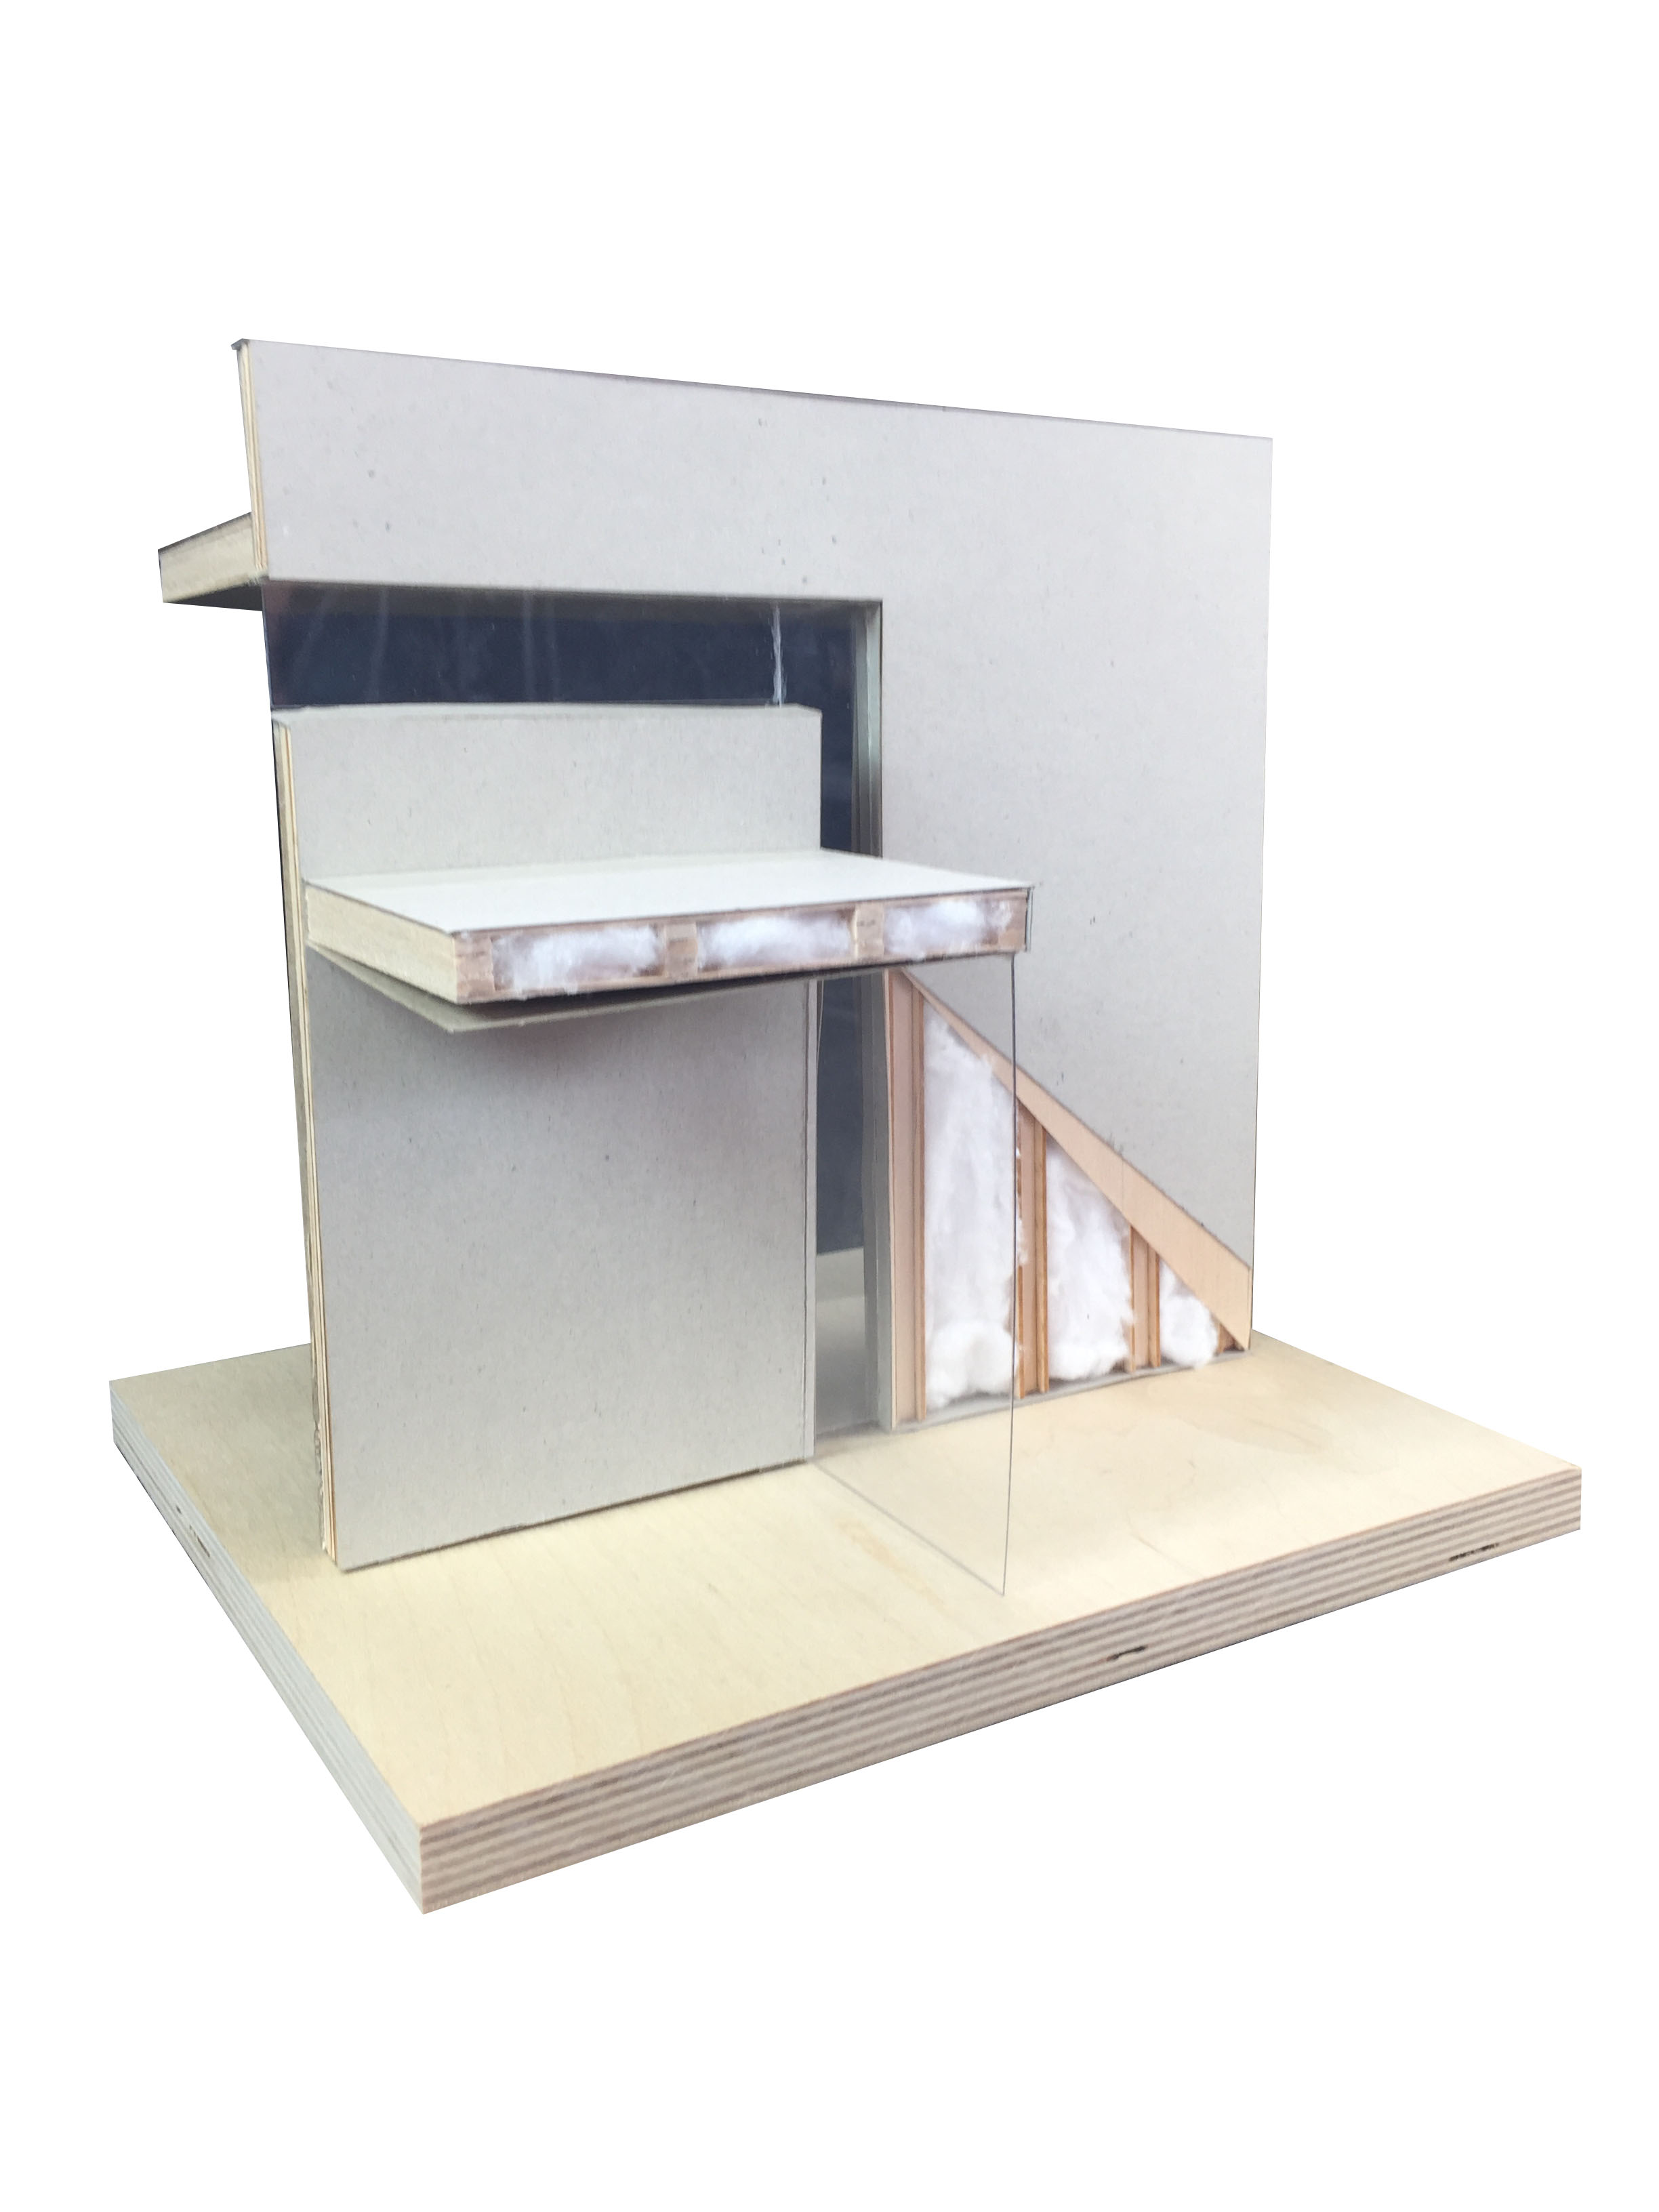 Detailed Construction Model